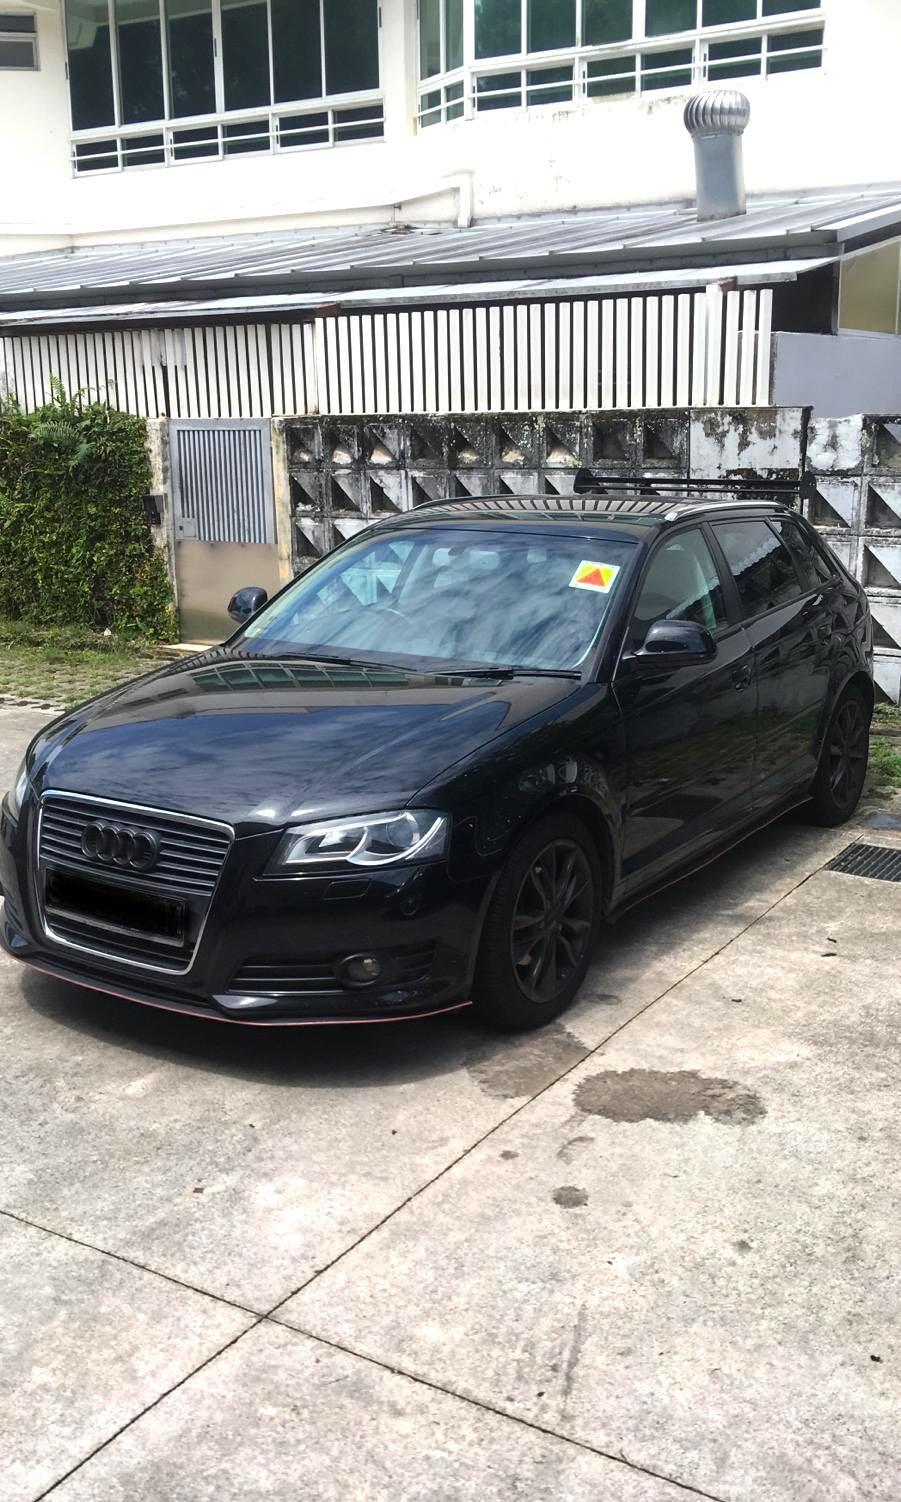 Audi A3 hatchback sportsback sporty four door sedan in black